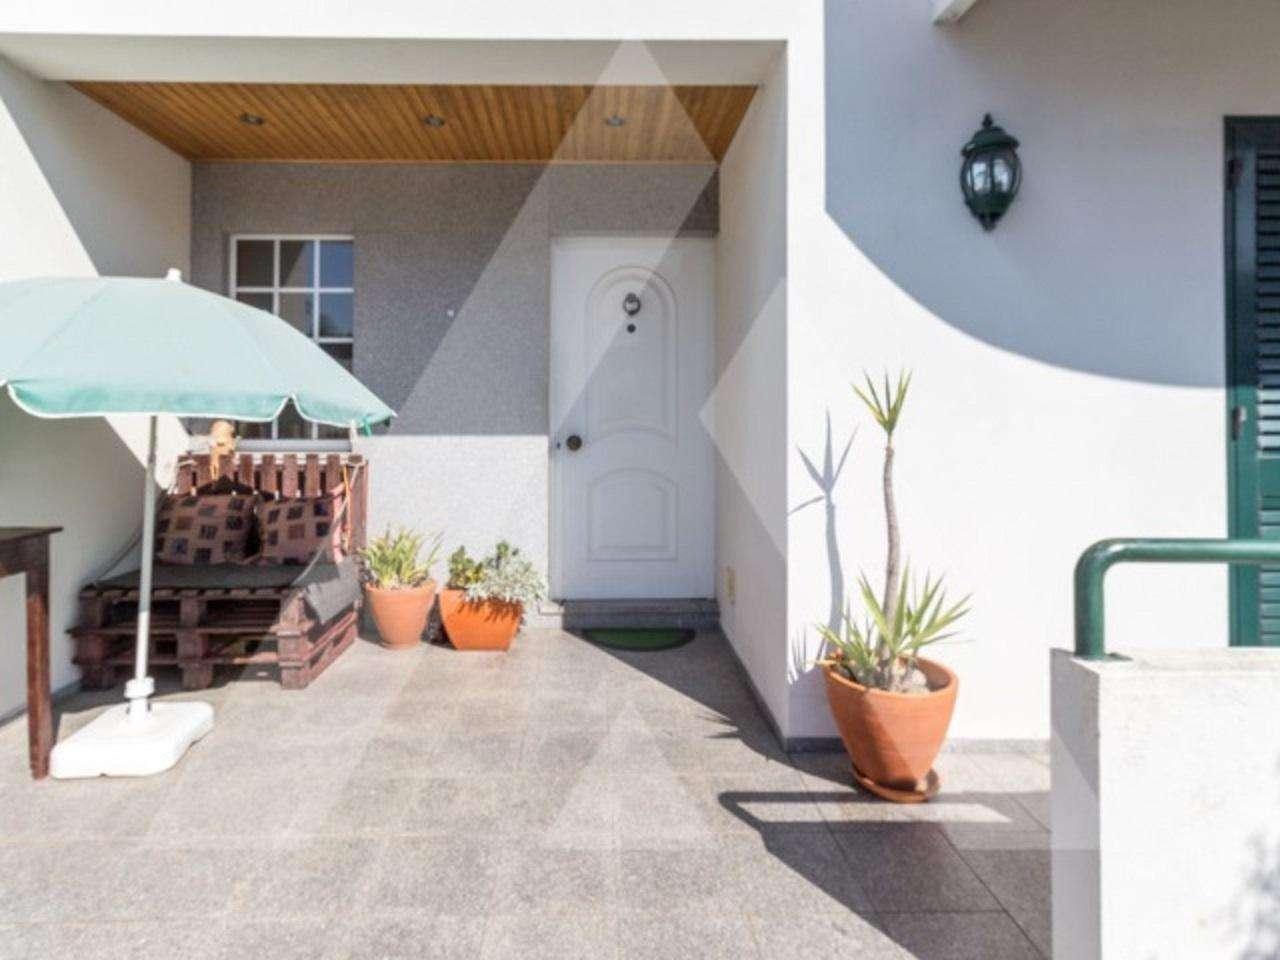 Moradia para comprar, Vila de Cucujães, Aveiro - Foto 2